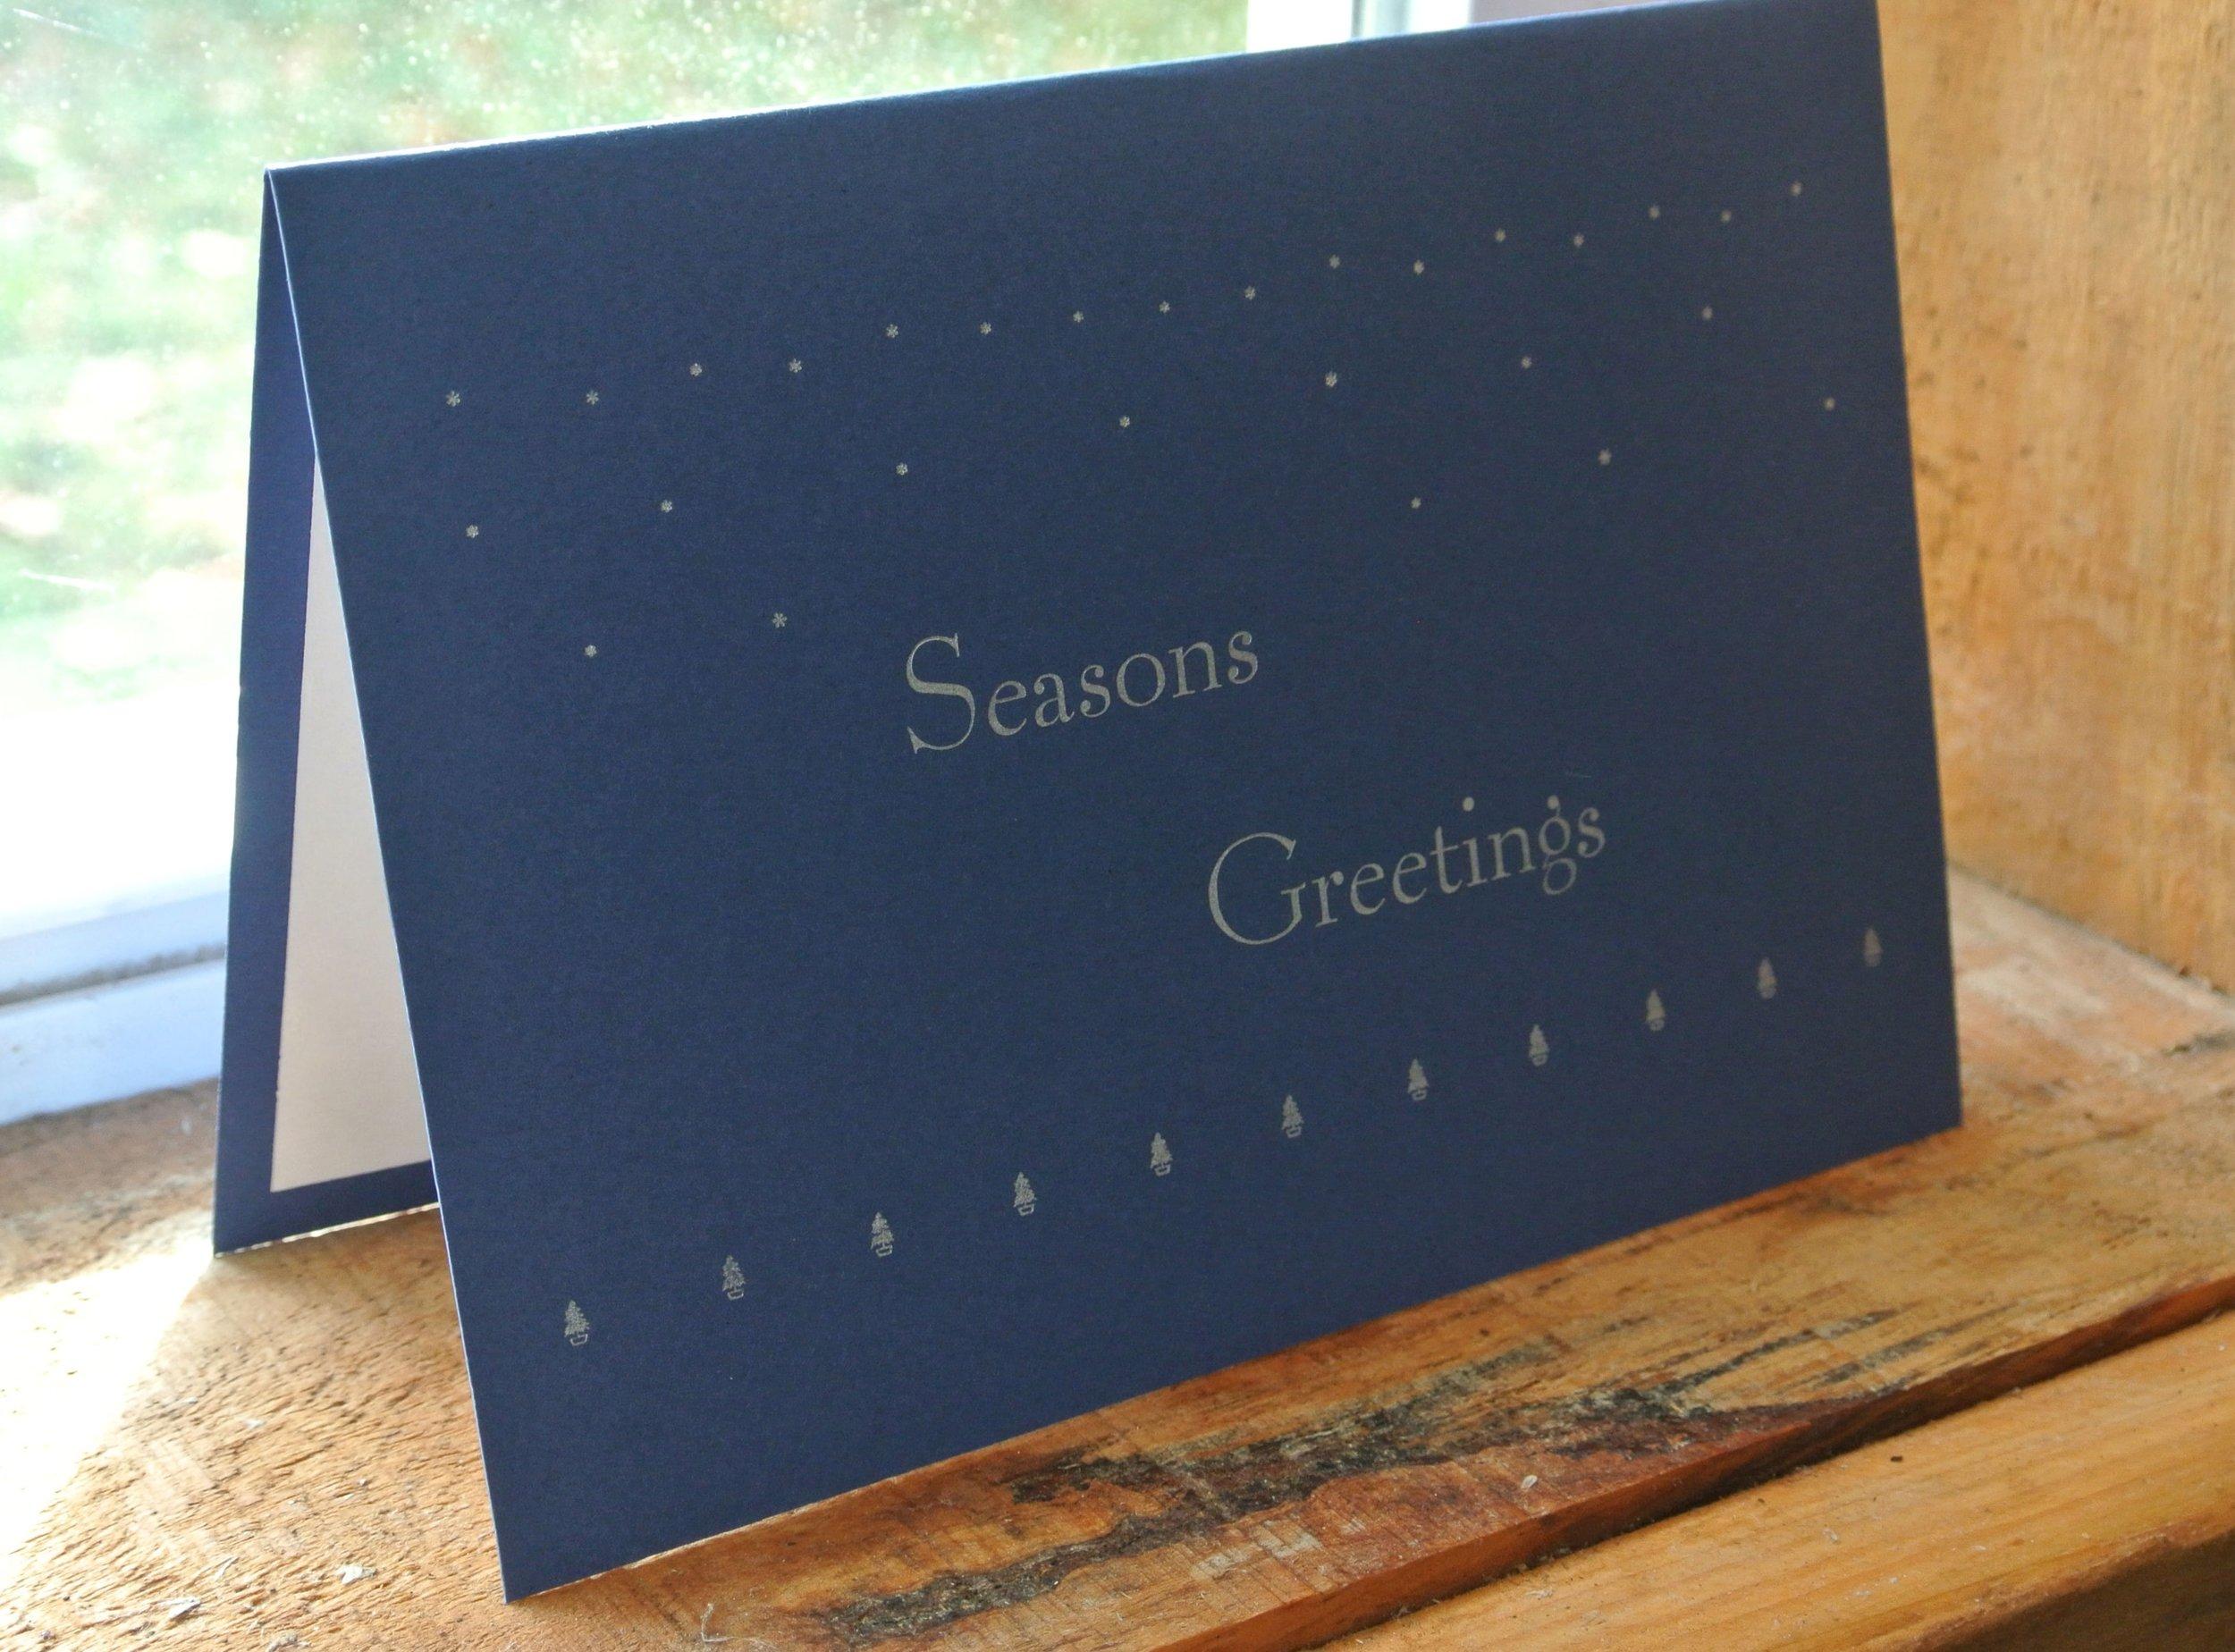 SeasonsGreetings-min.jpg